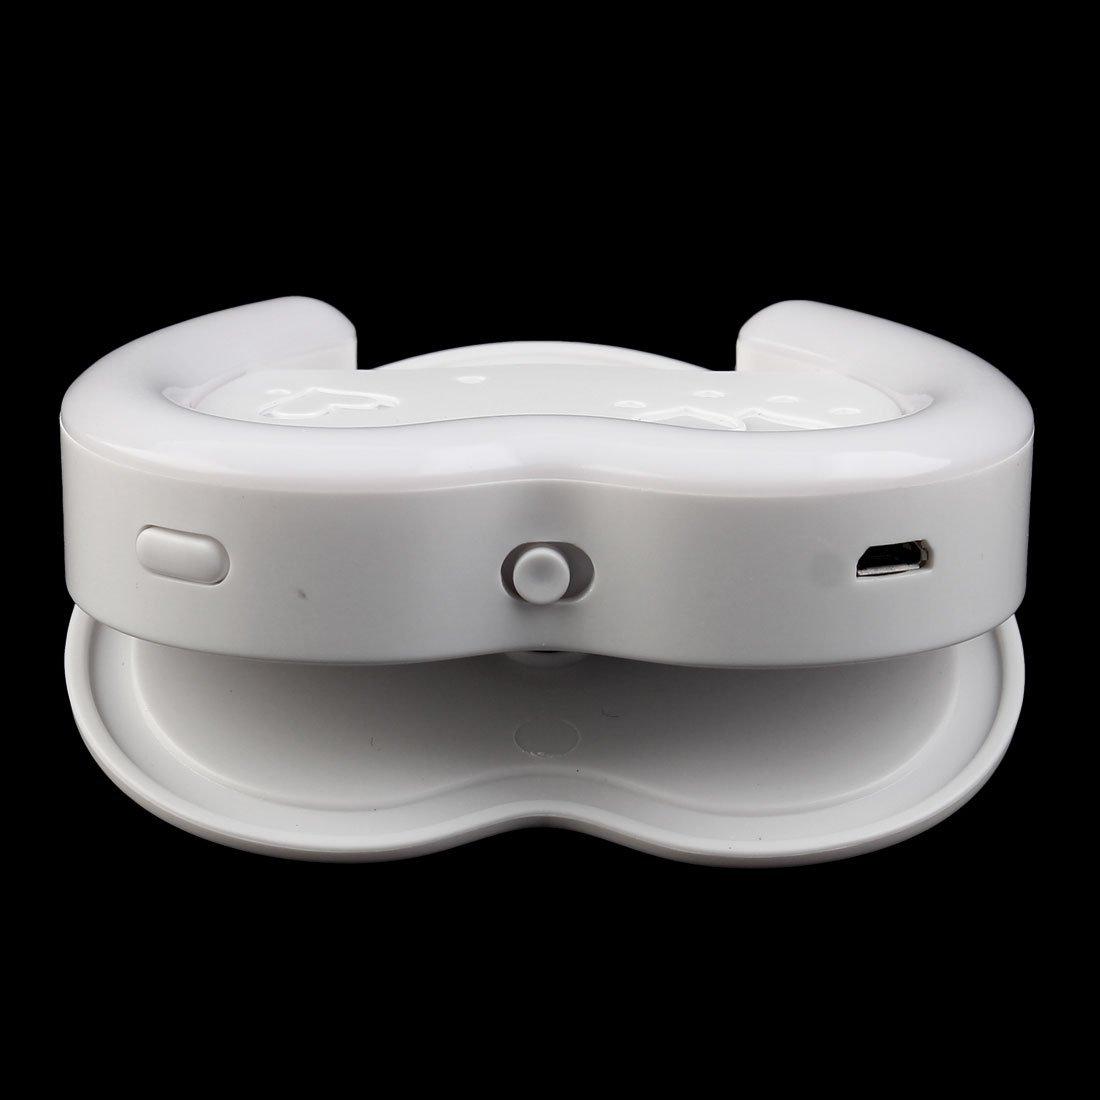 eDealMax LED dimmerabili ricaricabile Selfie anello luce Bianca per dispositivi intelligenti